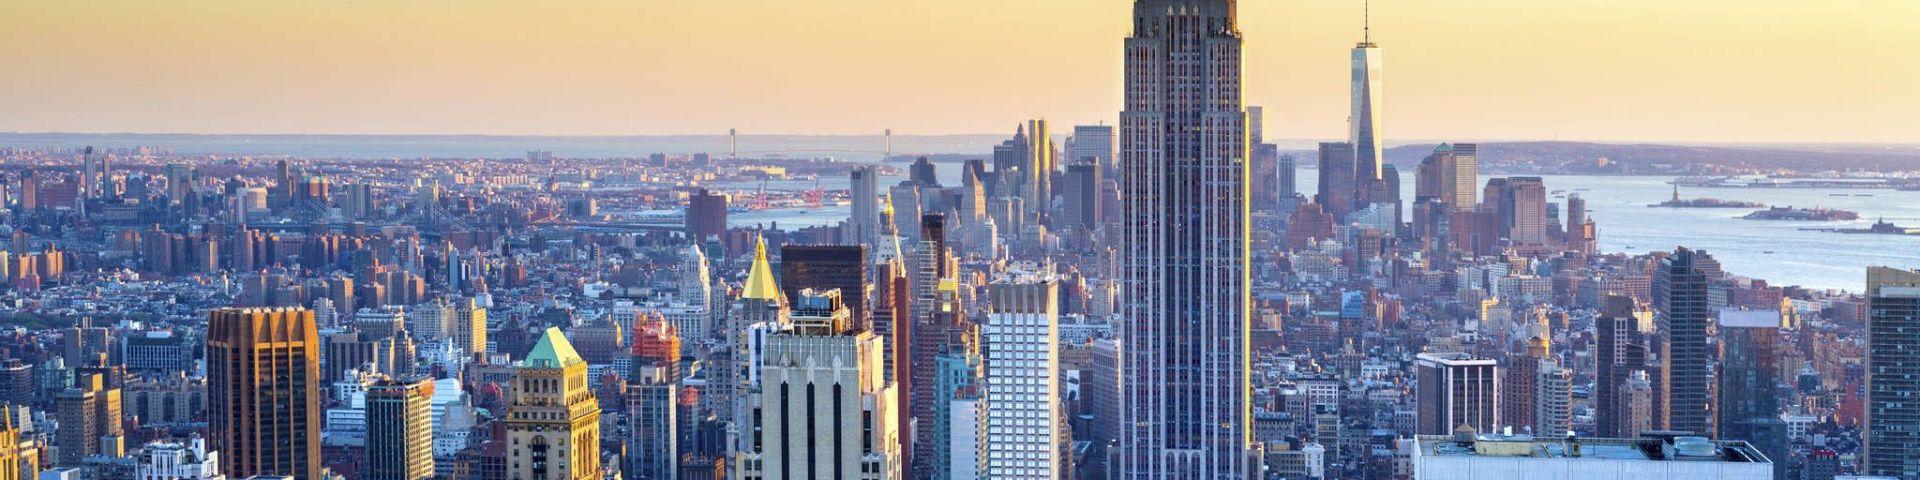 New York Holidays - zum Bestpreis